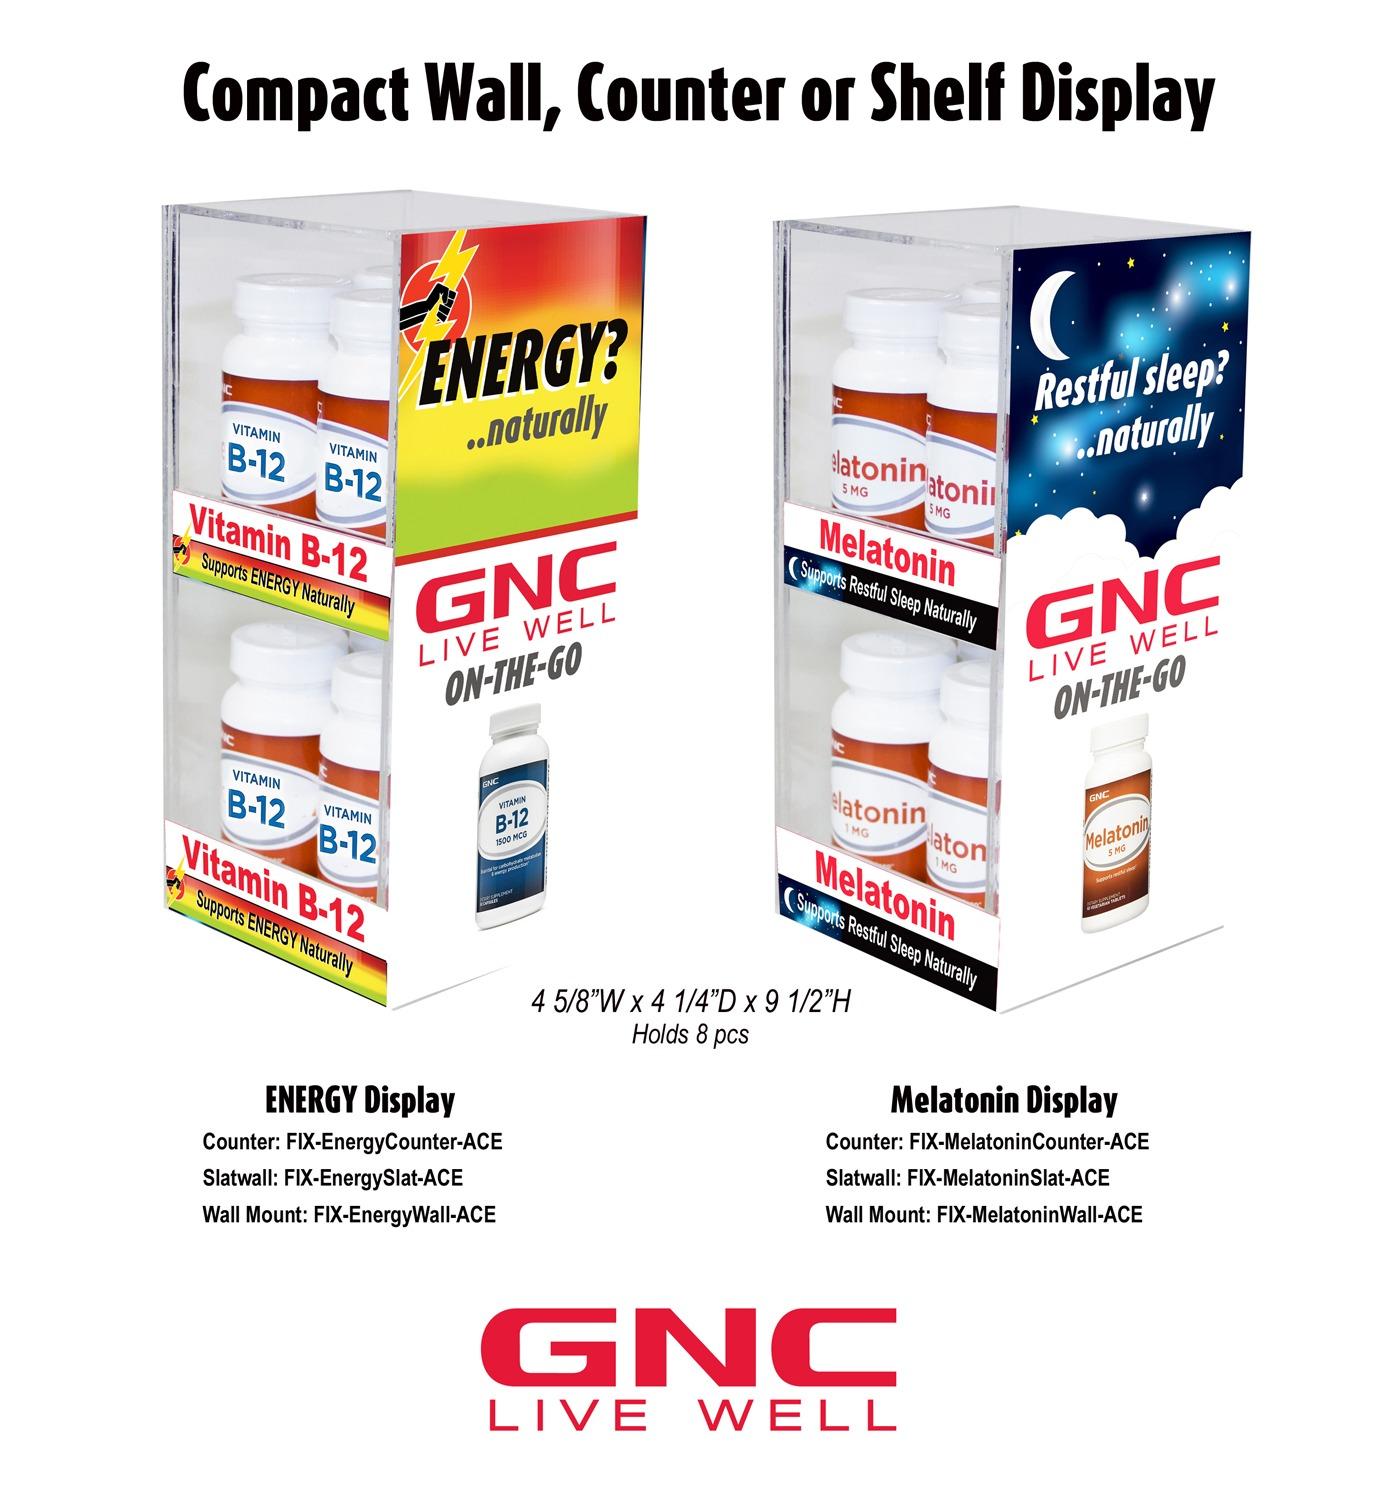 GNC Compacy Wall-Counter-Shelf Display_e